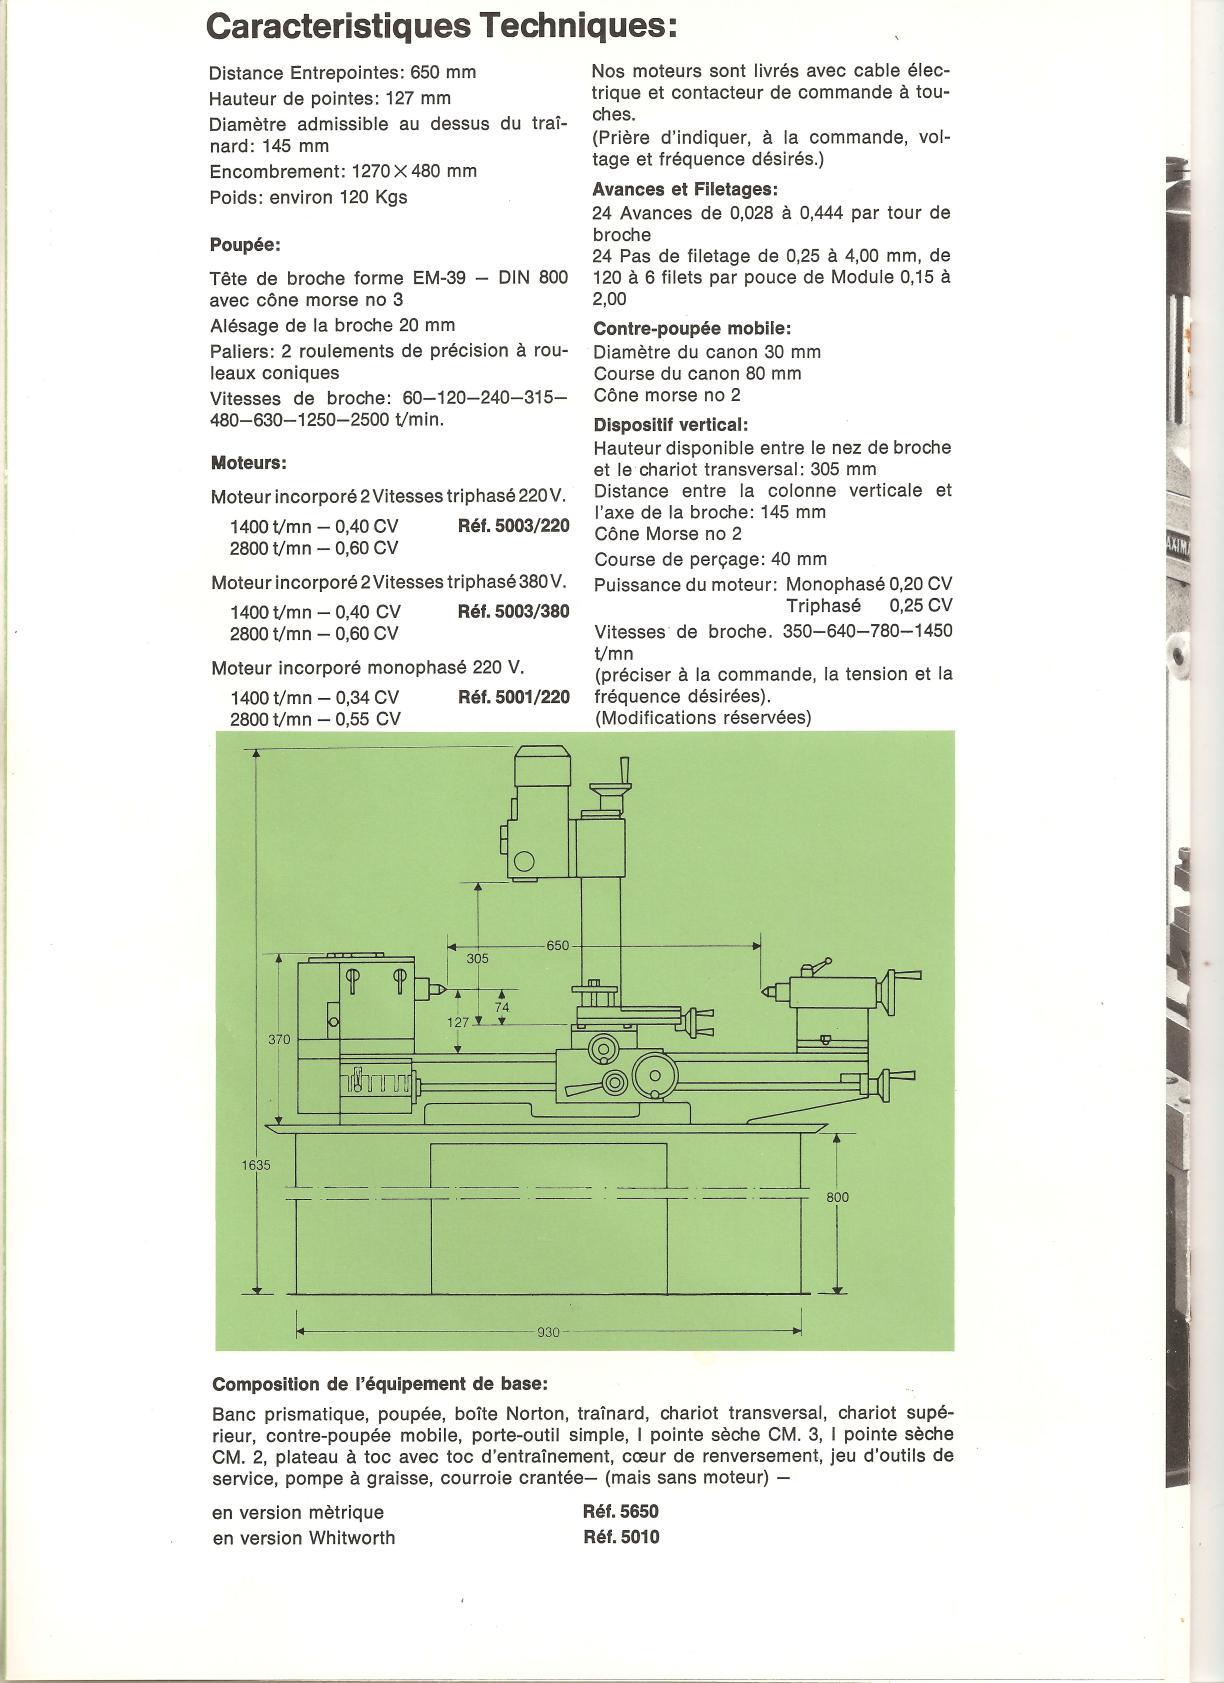 Emco Maximat V10 & V10 P (+ mentor10) Uw4618